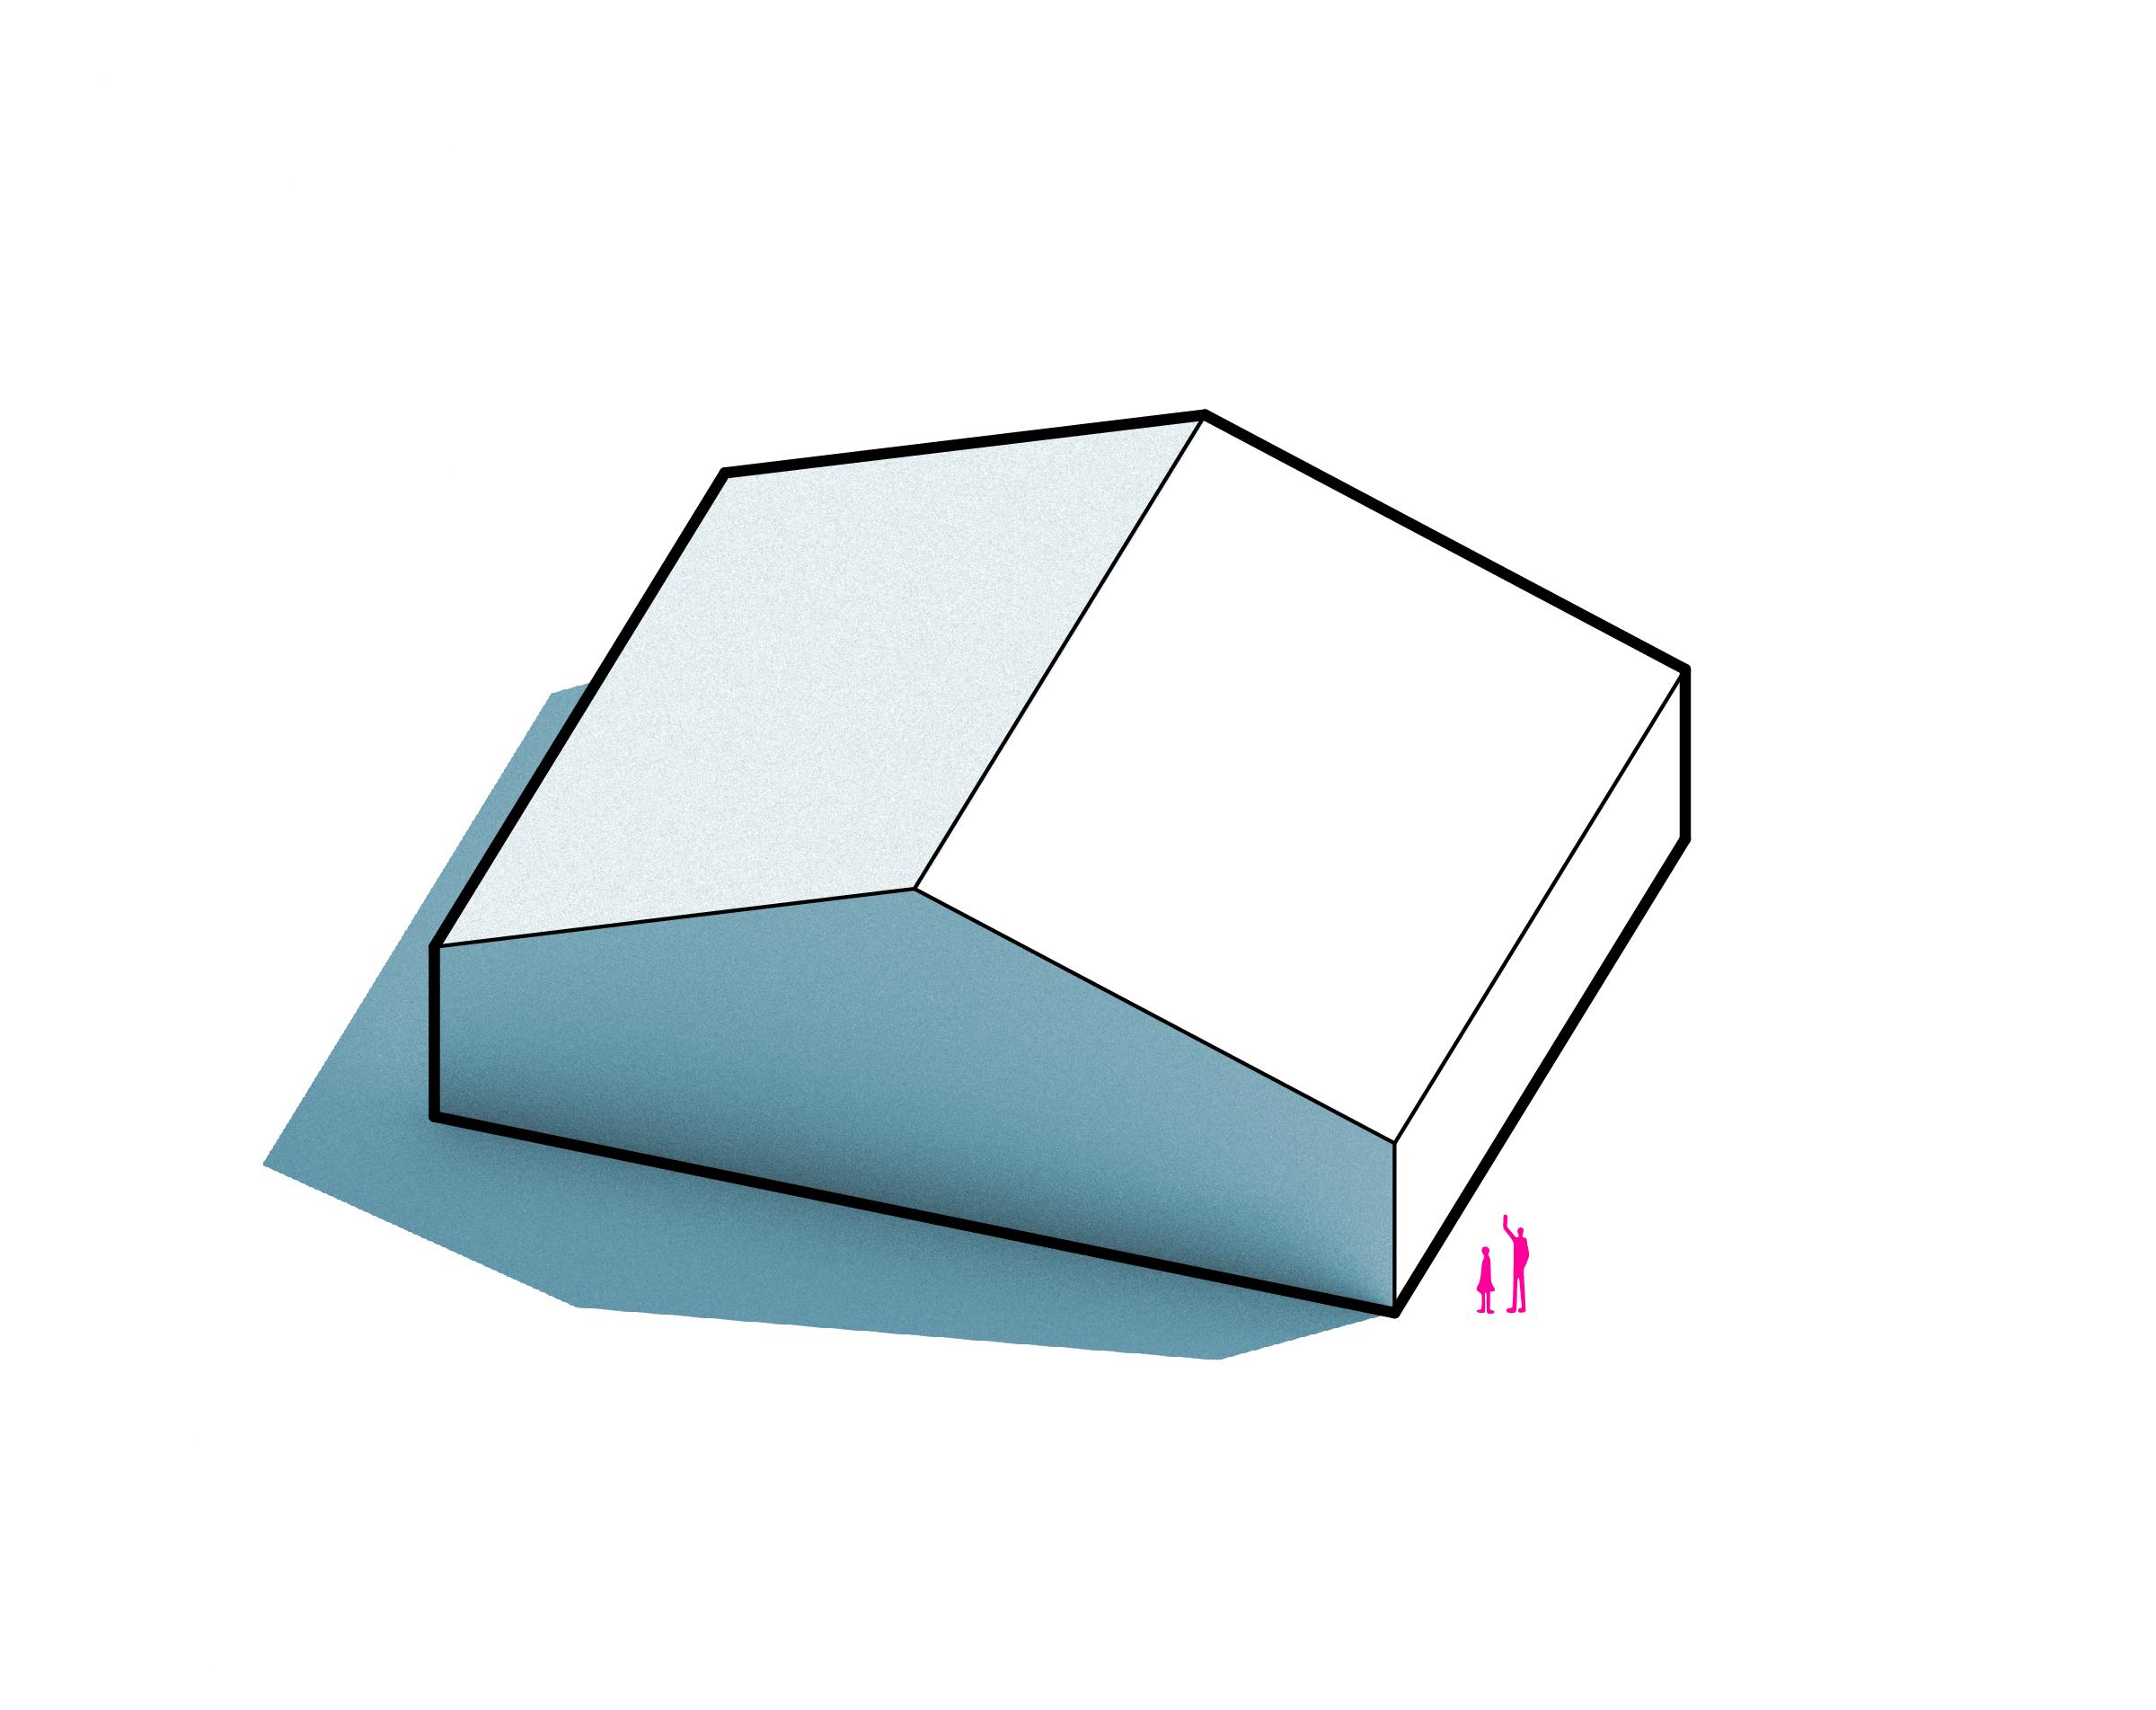 R_House Process Axon-01.jpg